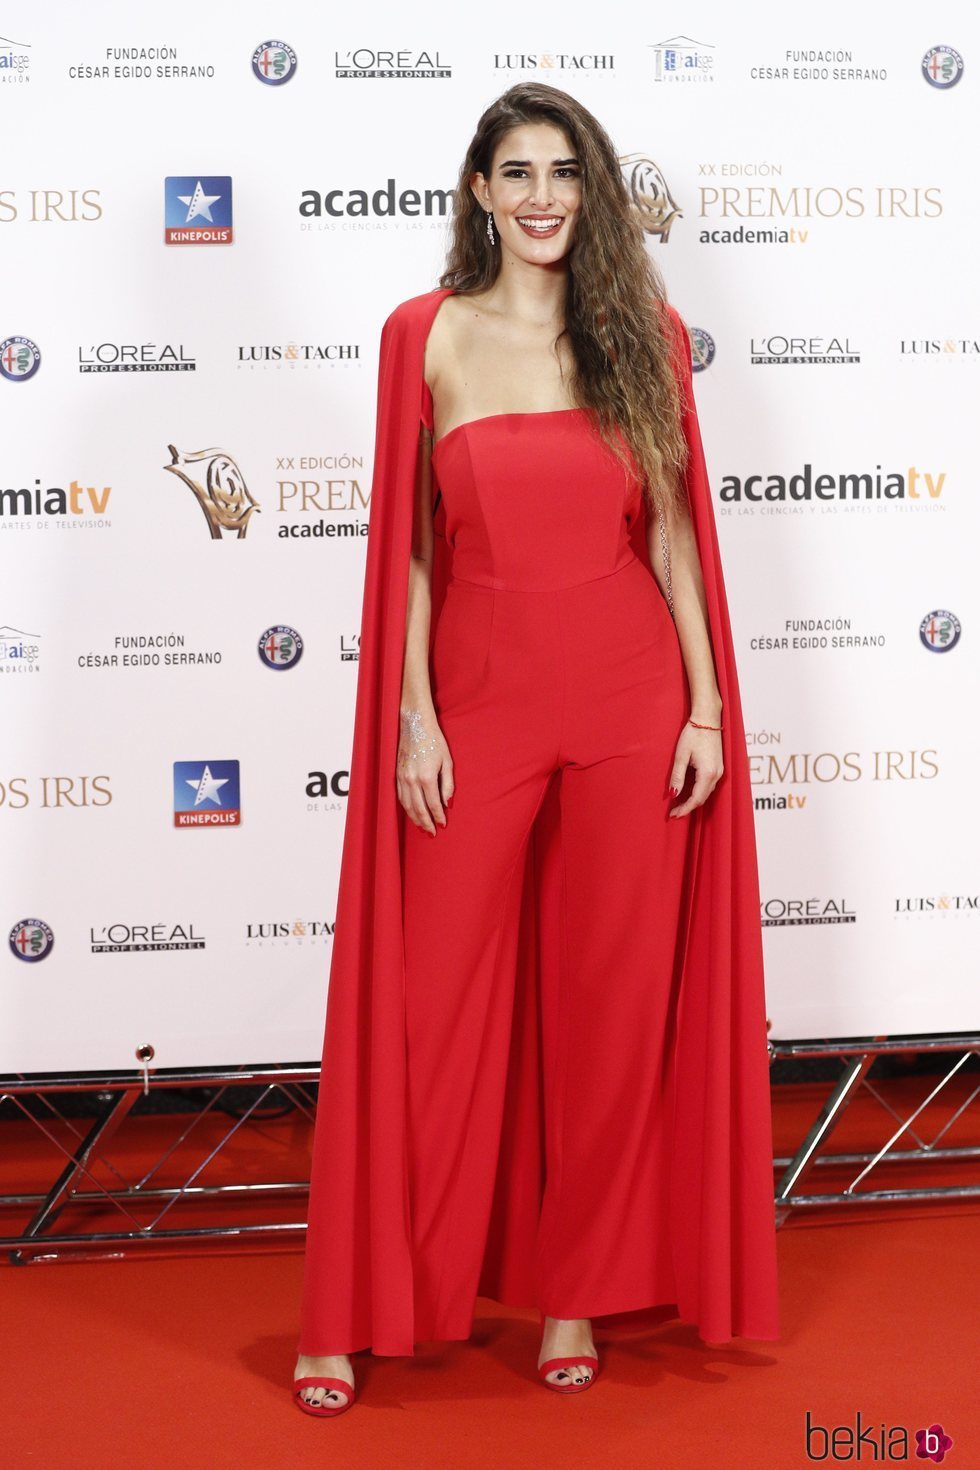 Lidia Torrent en los Premios Iris 2018